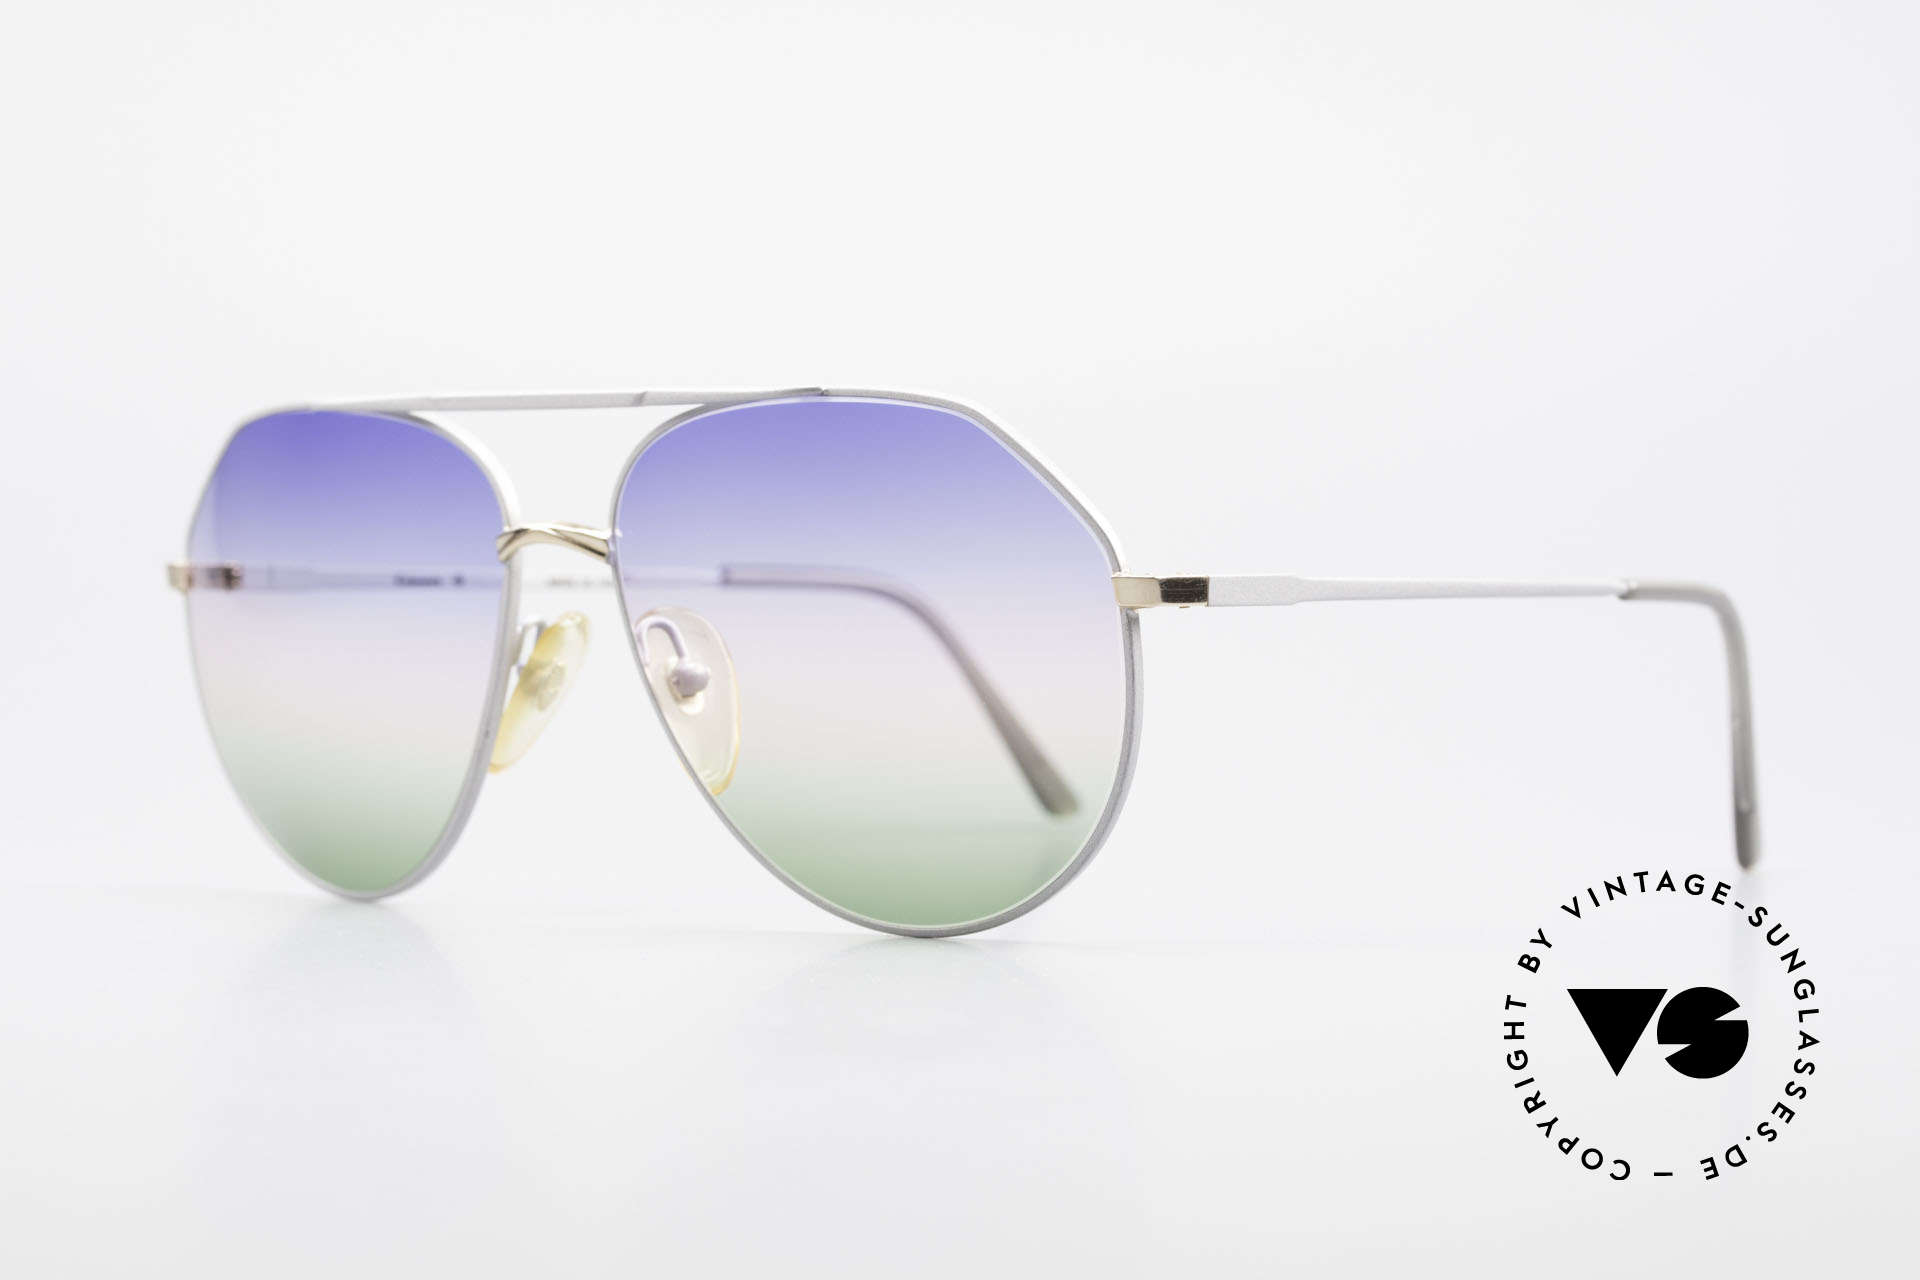 Casanova 6052 Titanium Aviator Sunglasses, tricolored gradient lenses (eye-catching & 100% UV), Made for Men and Women